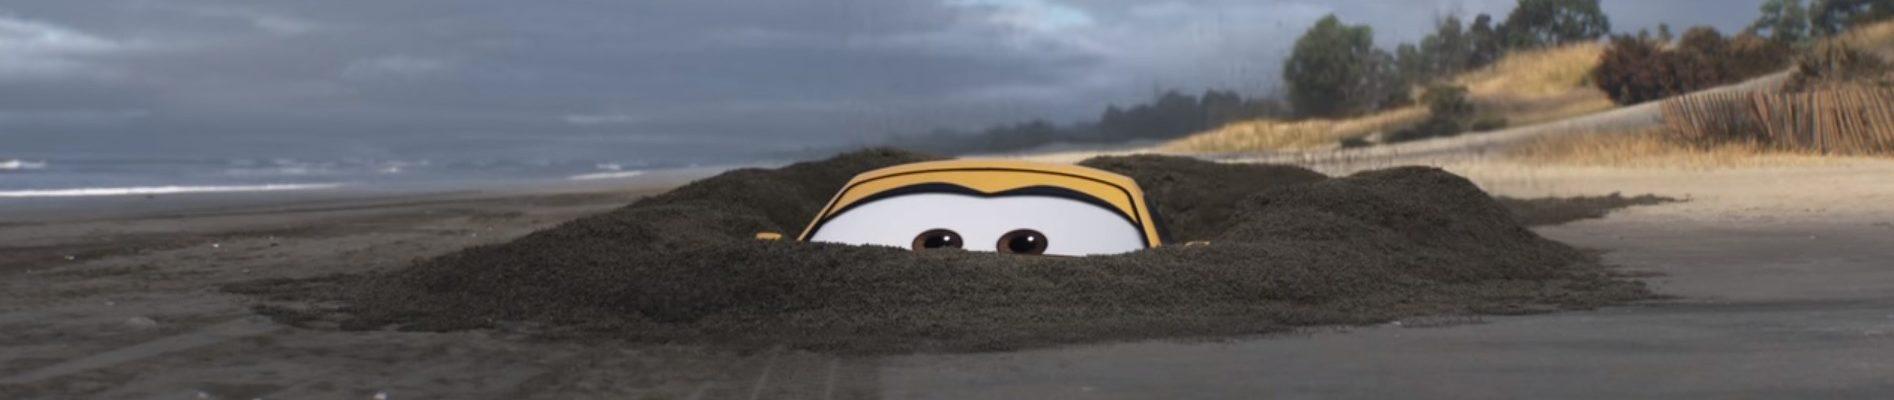 disney & pixar animation news